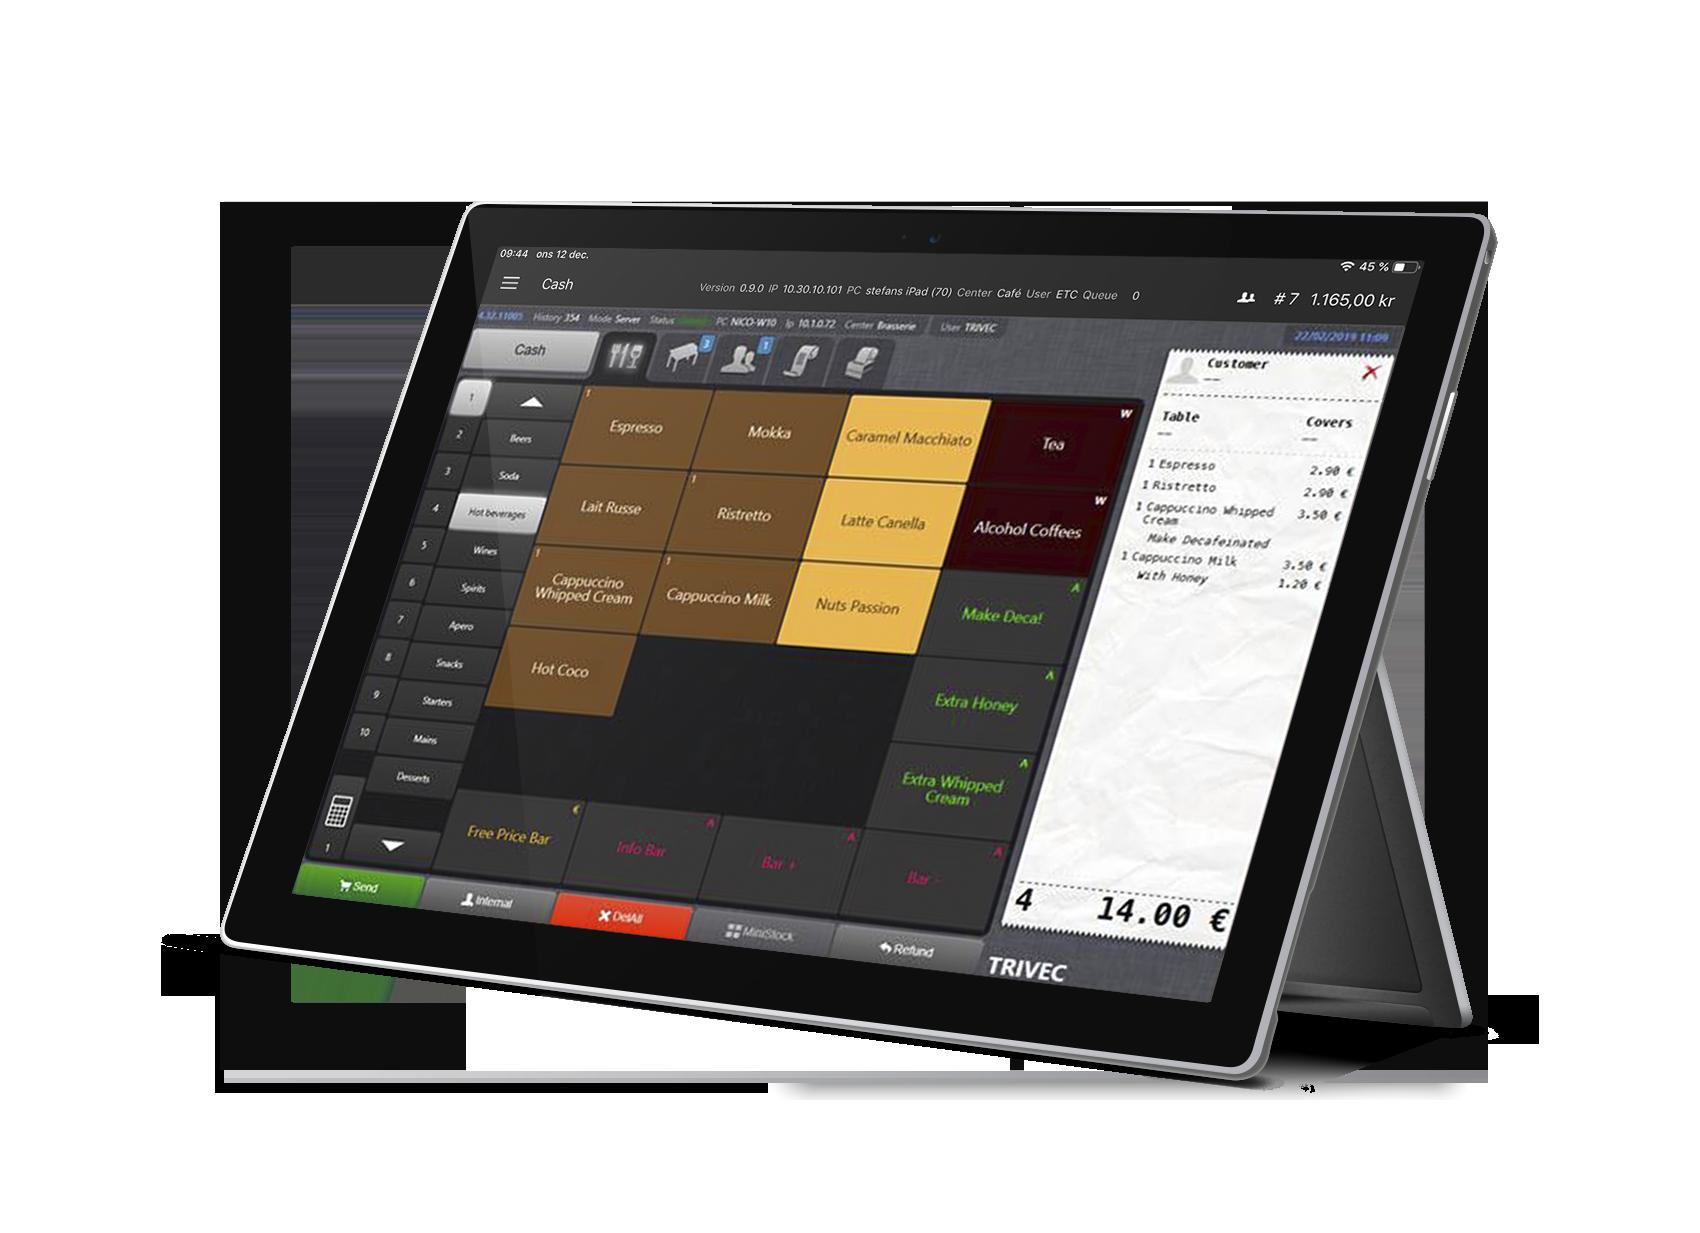 Trivec Go - mobile POS systems for restaurants